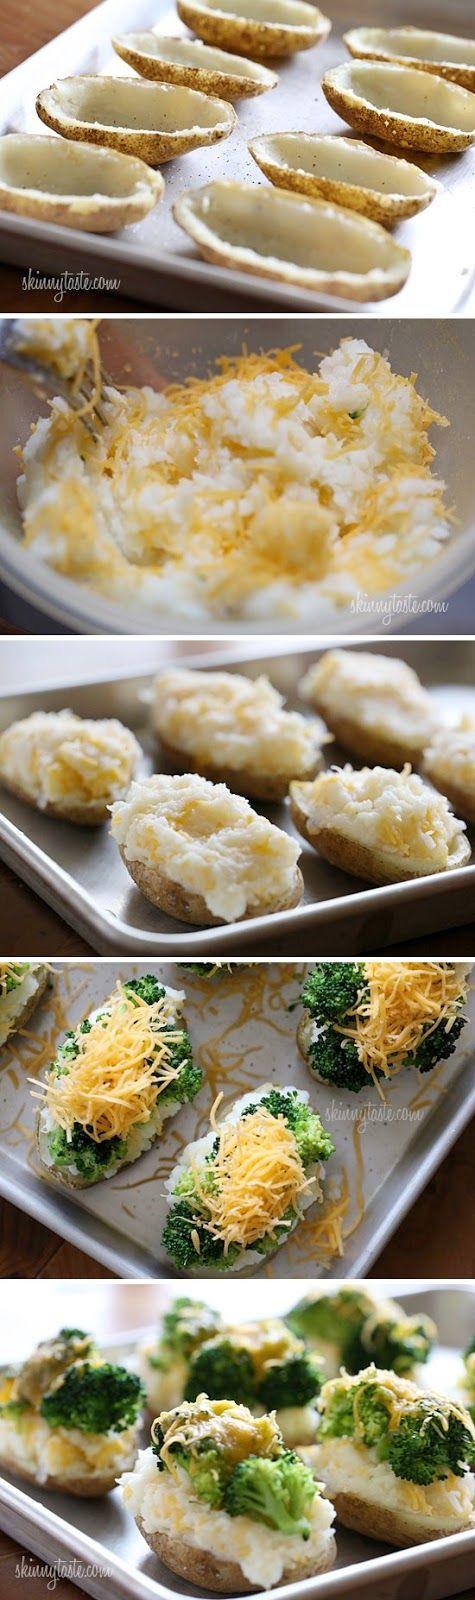 Broccoli Cheese Baked Potatoes | Recipe Sharing Community